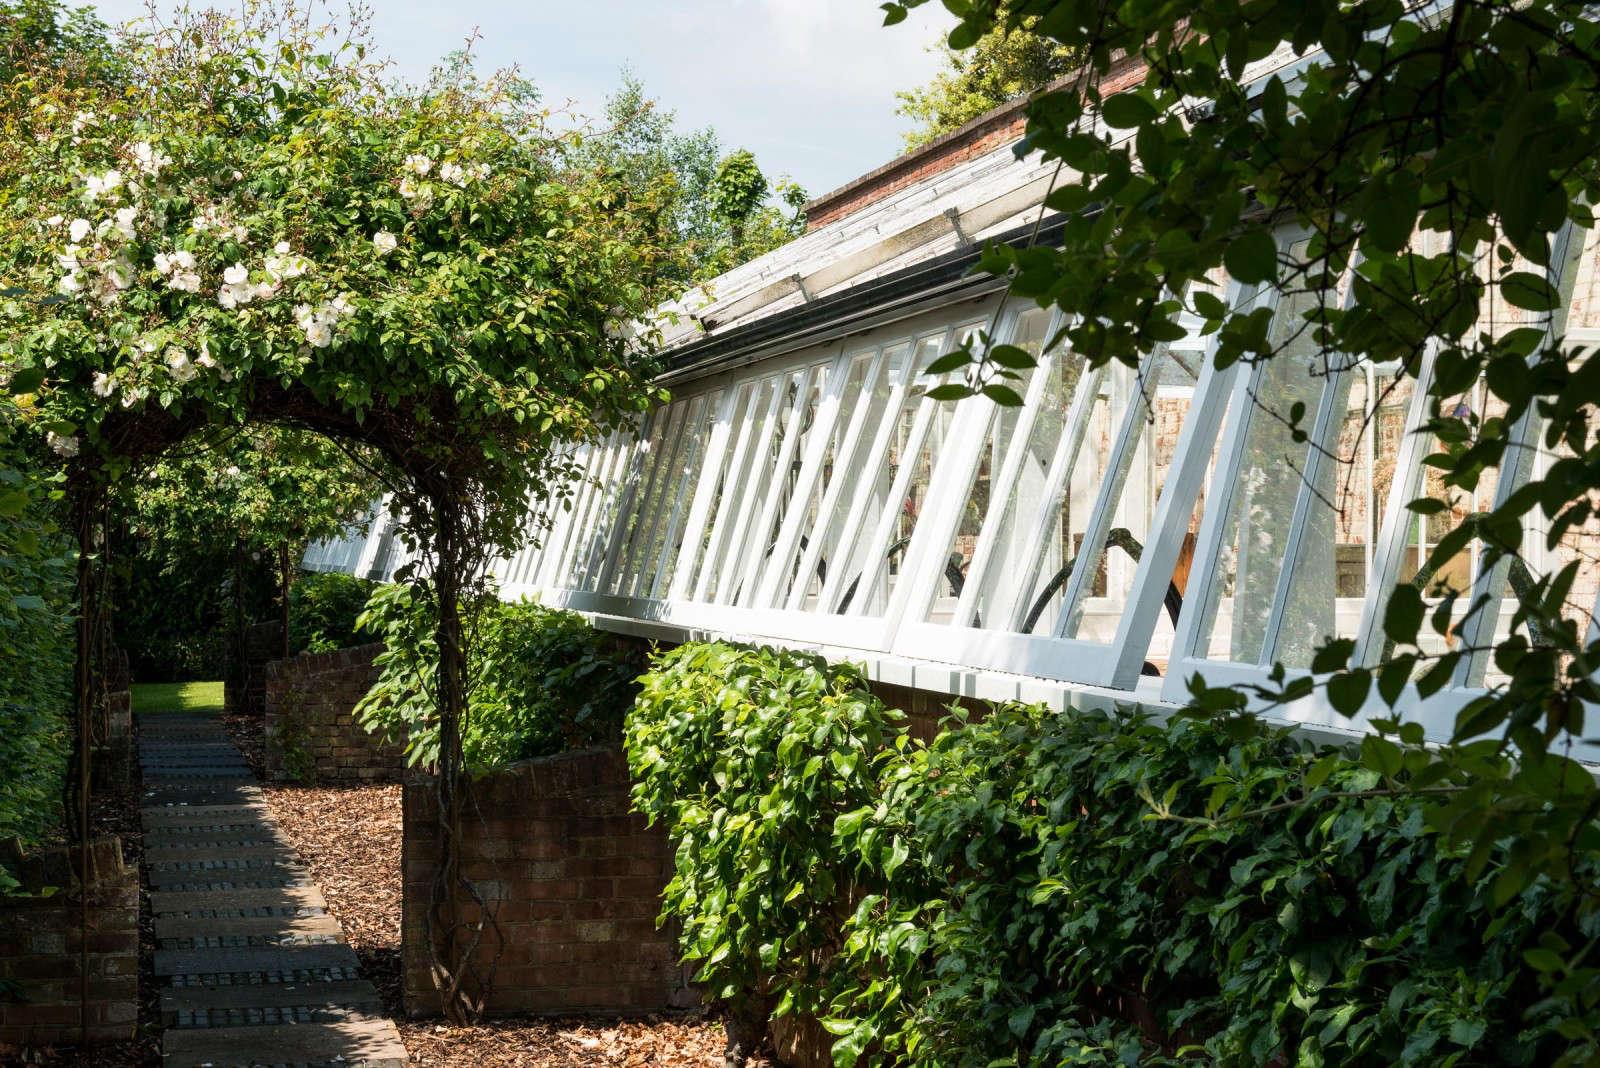 greenhouse-conversion-kent-themodernhouse-arbor-path-6